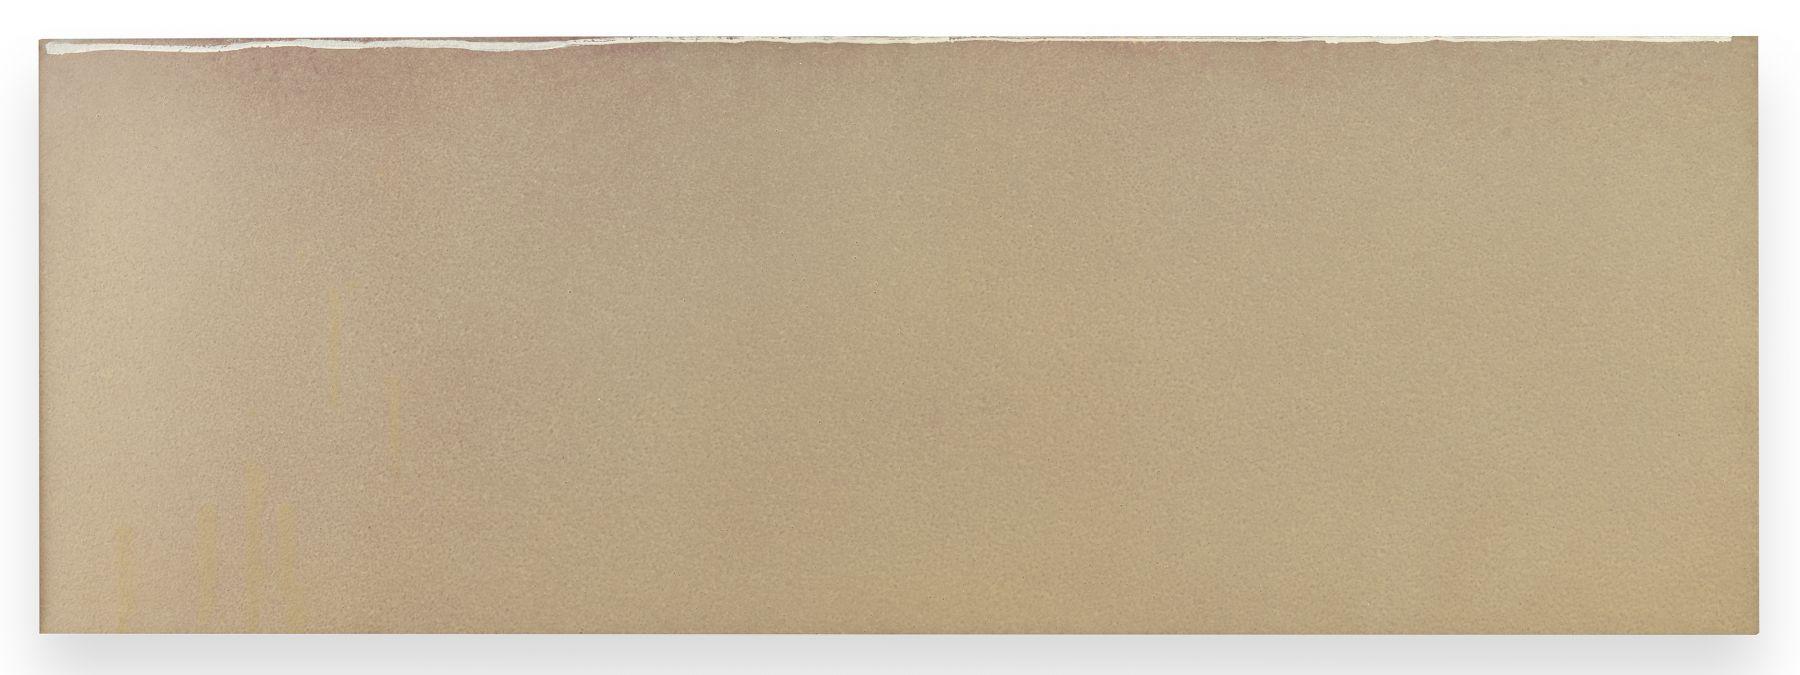 Absalom Passage-Seventeen, 1973, Acrylic on canvas